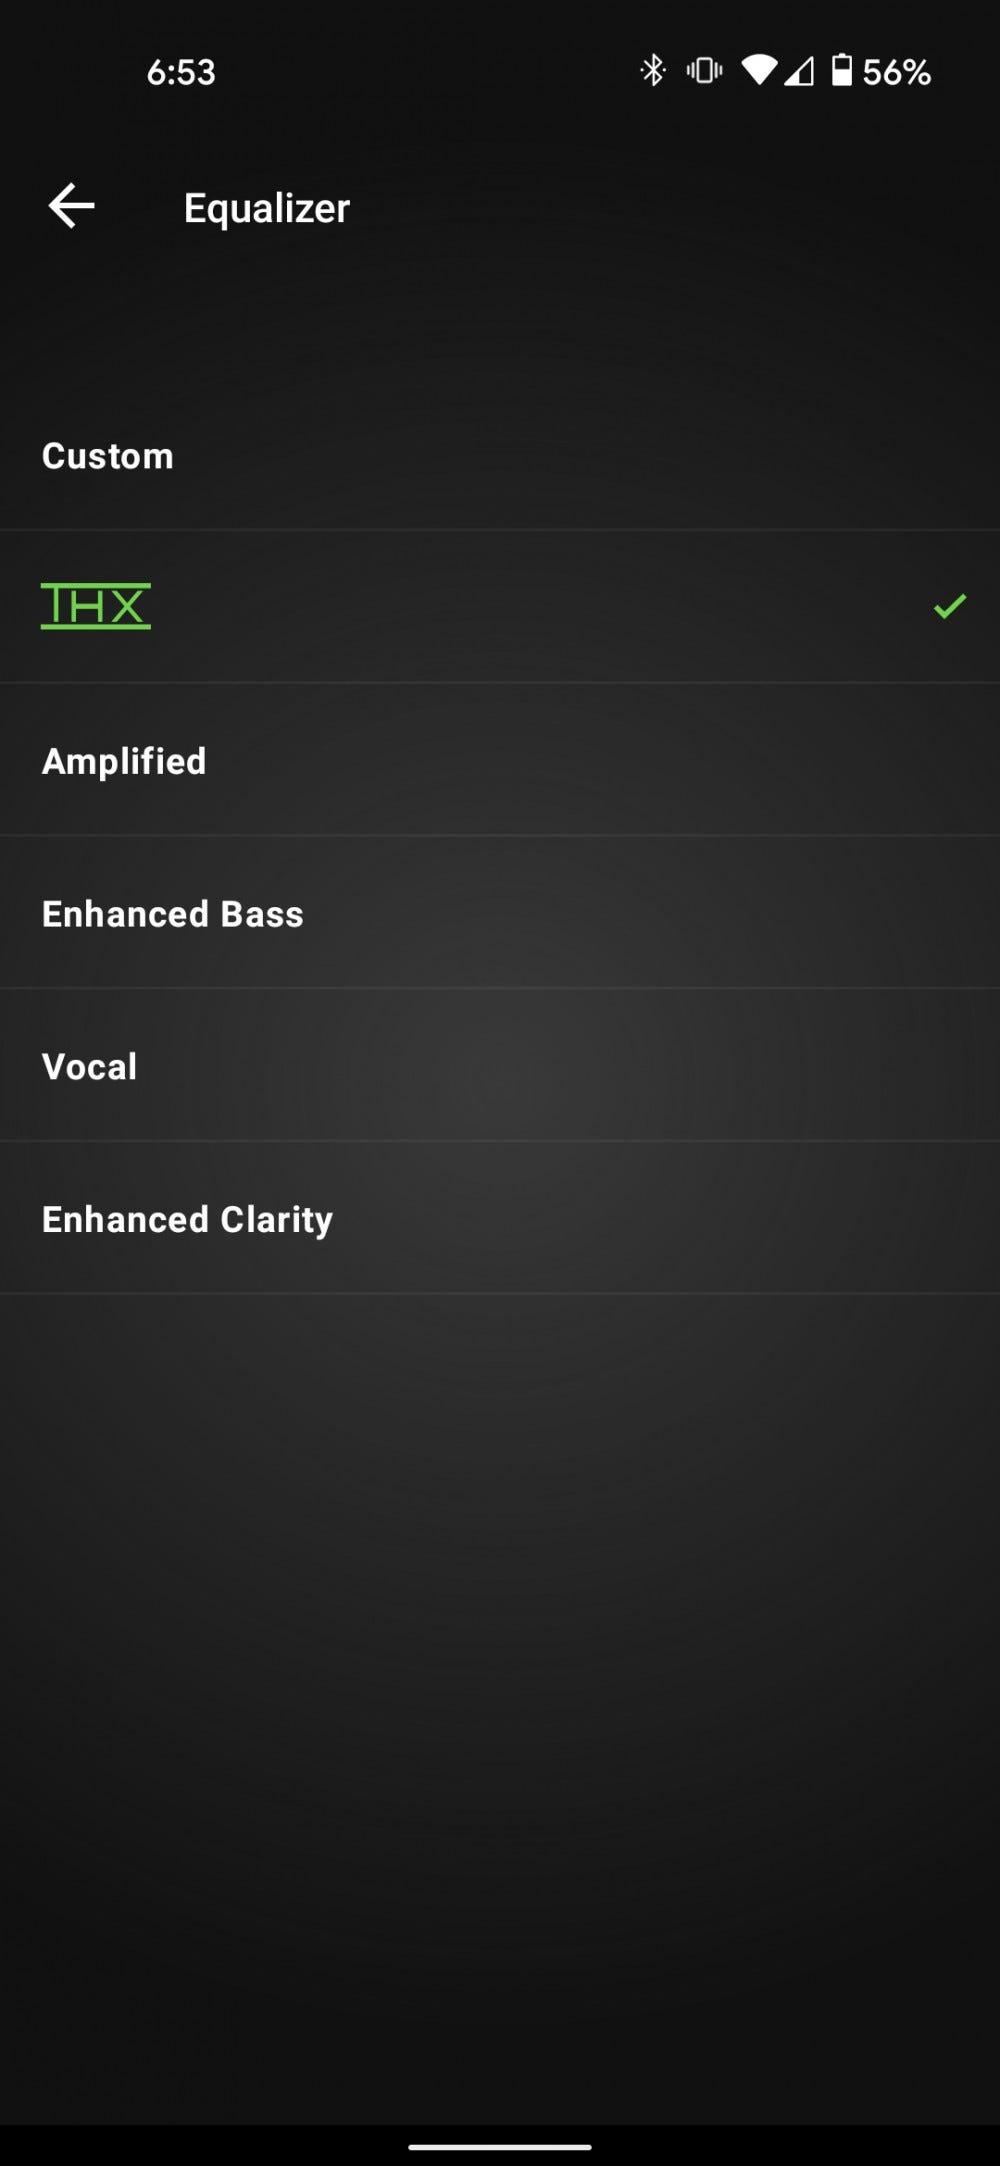 A screenshot of the EQ presets